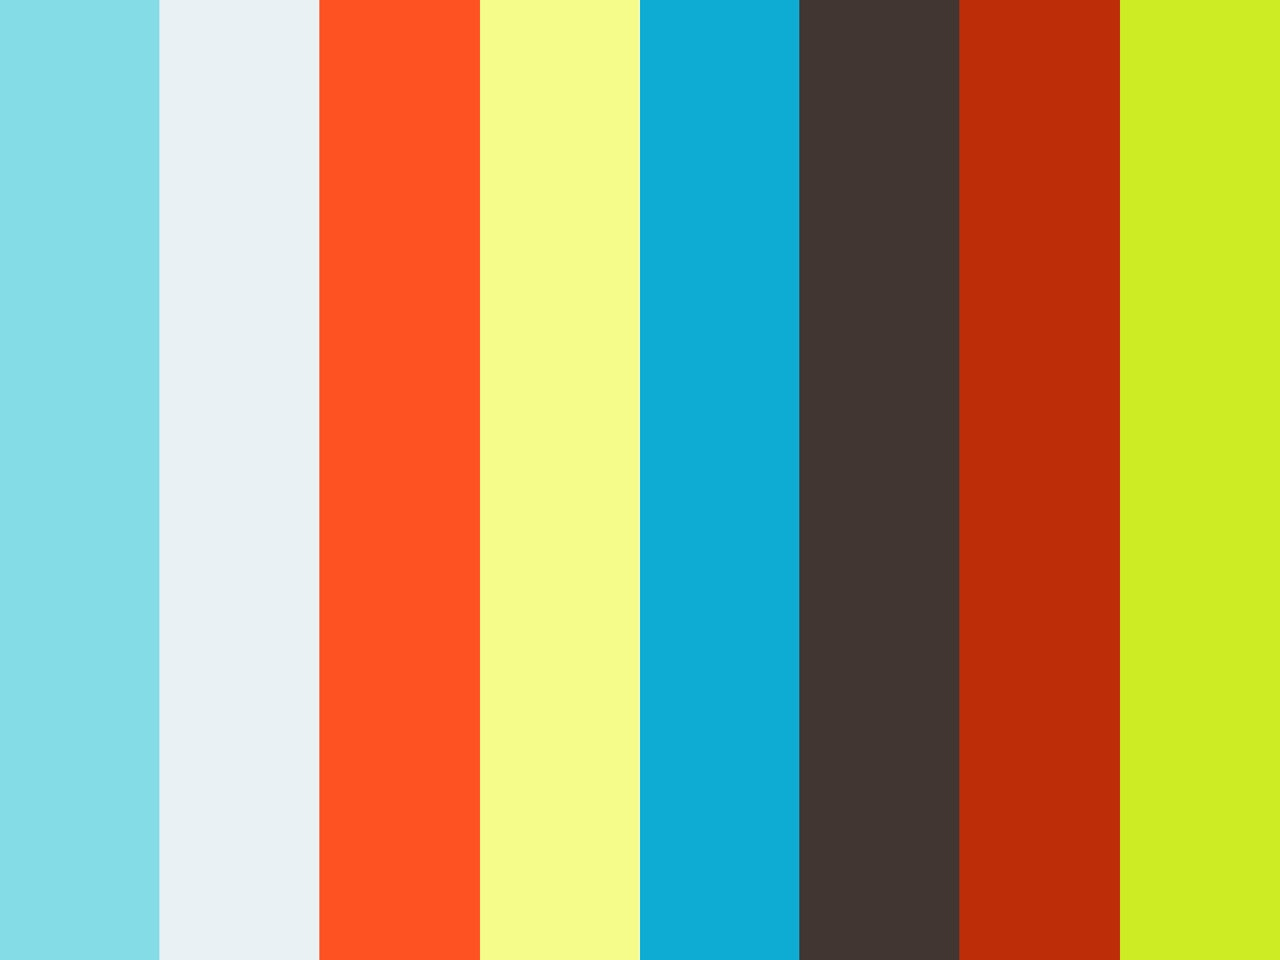 Pen Voice - 343 - Scott McMullin